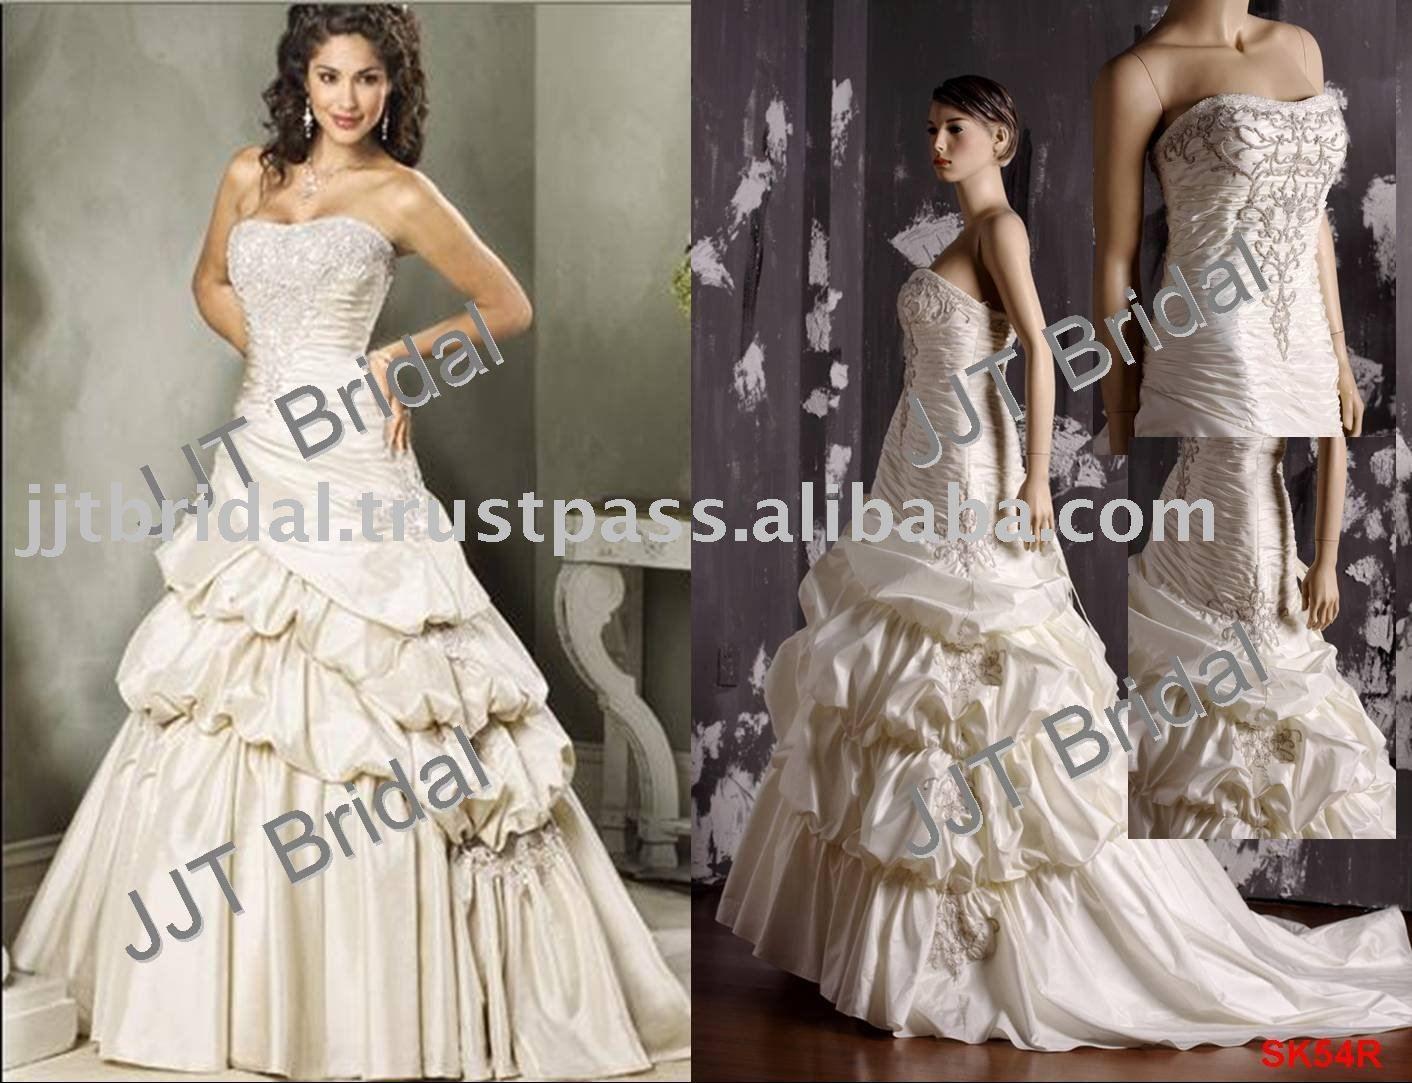 Famous wedding dresses  Dress bride  Modelando  Pinterest  Sweet hearts Water and Designers